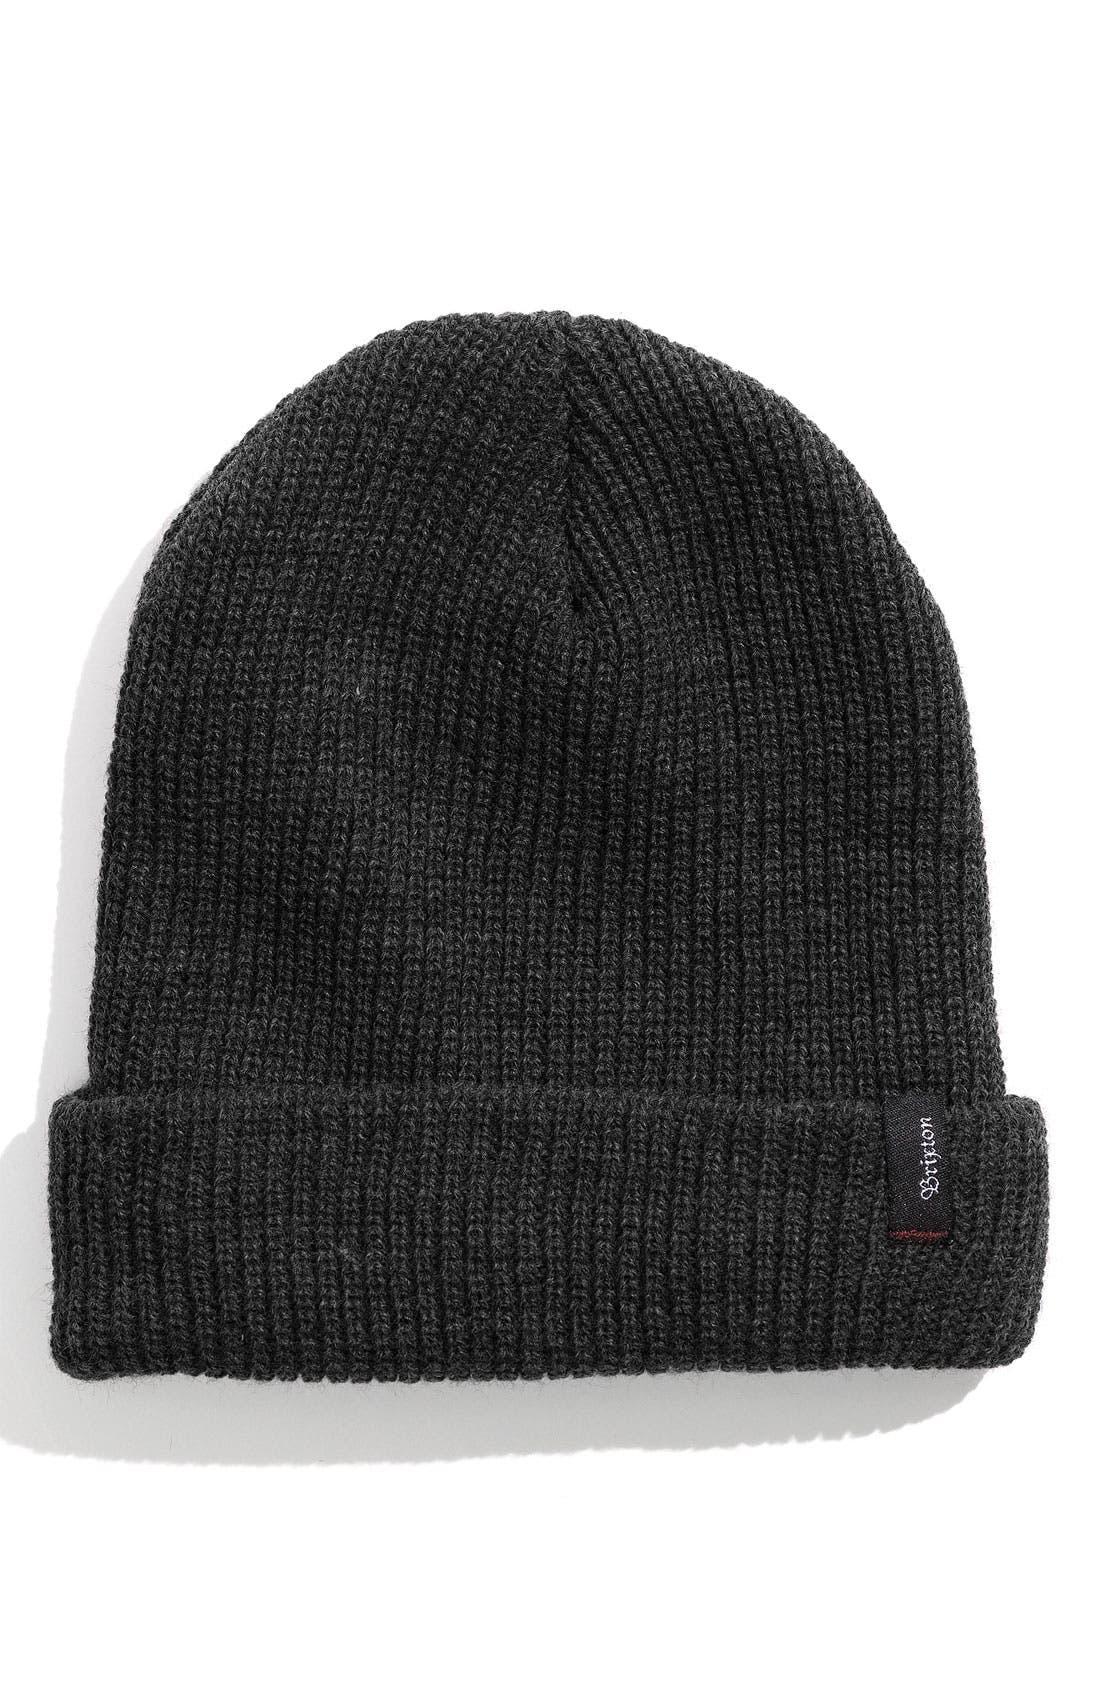 'Heist' Rib Knit Cap,                         Main,                         color,